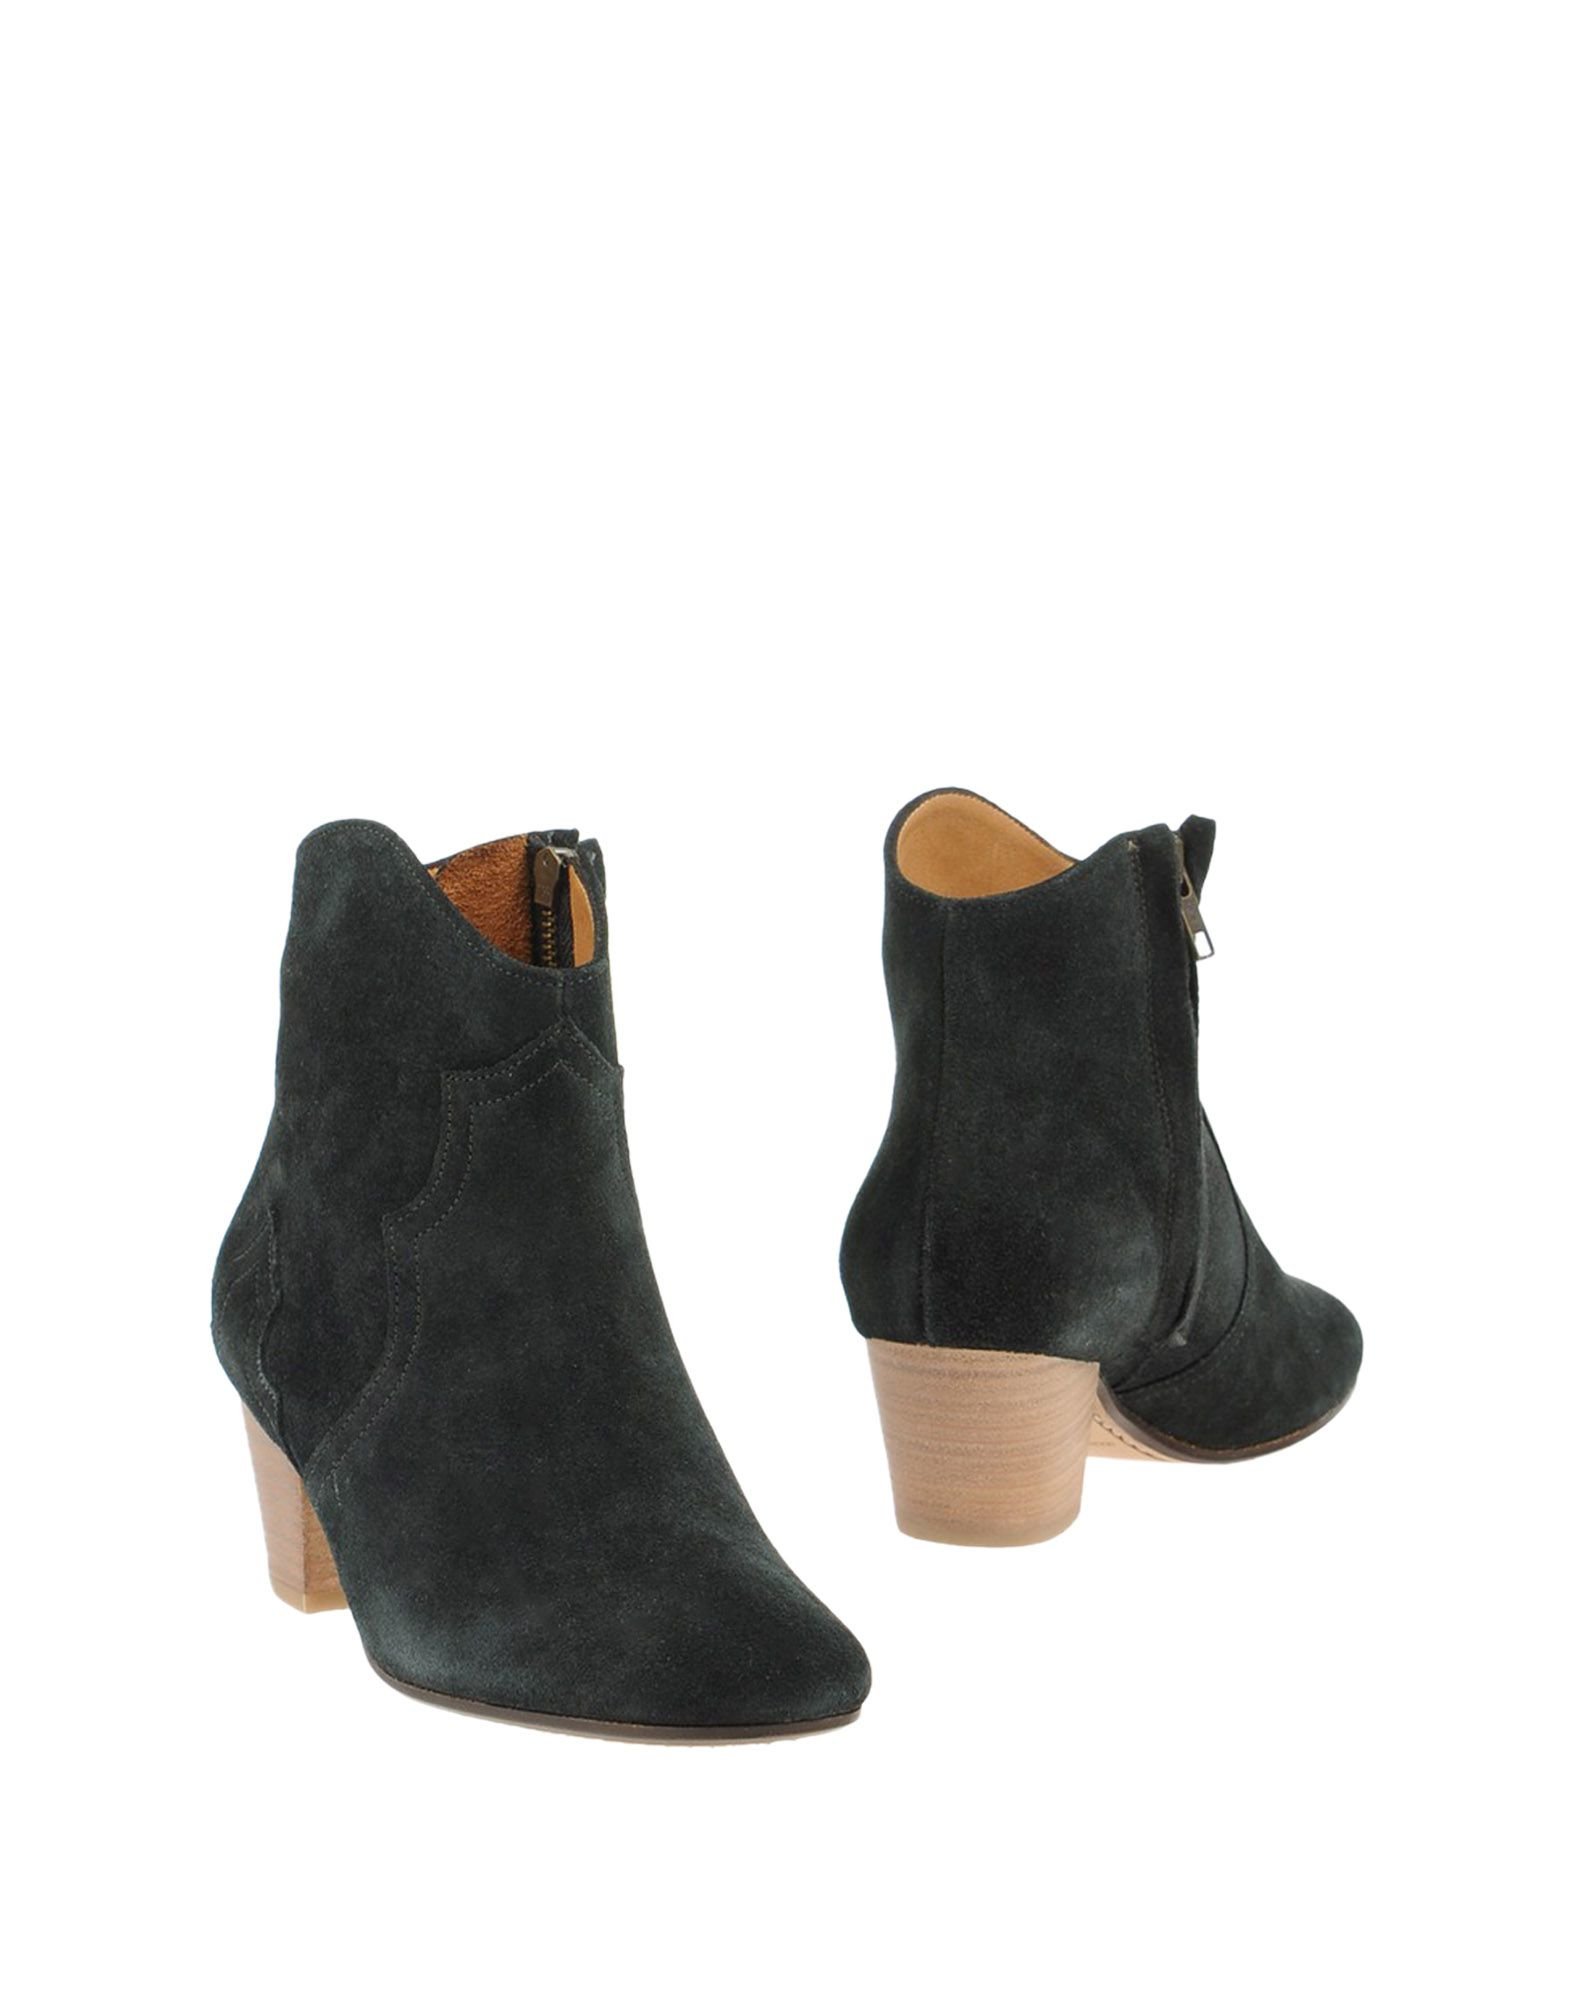 toile isabel marant ankle boots in black lyst. Black Bedroom Furniture Sets. Home Design Ideas